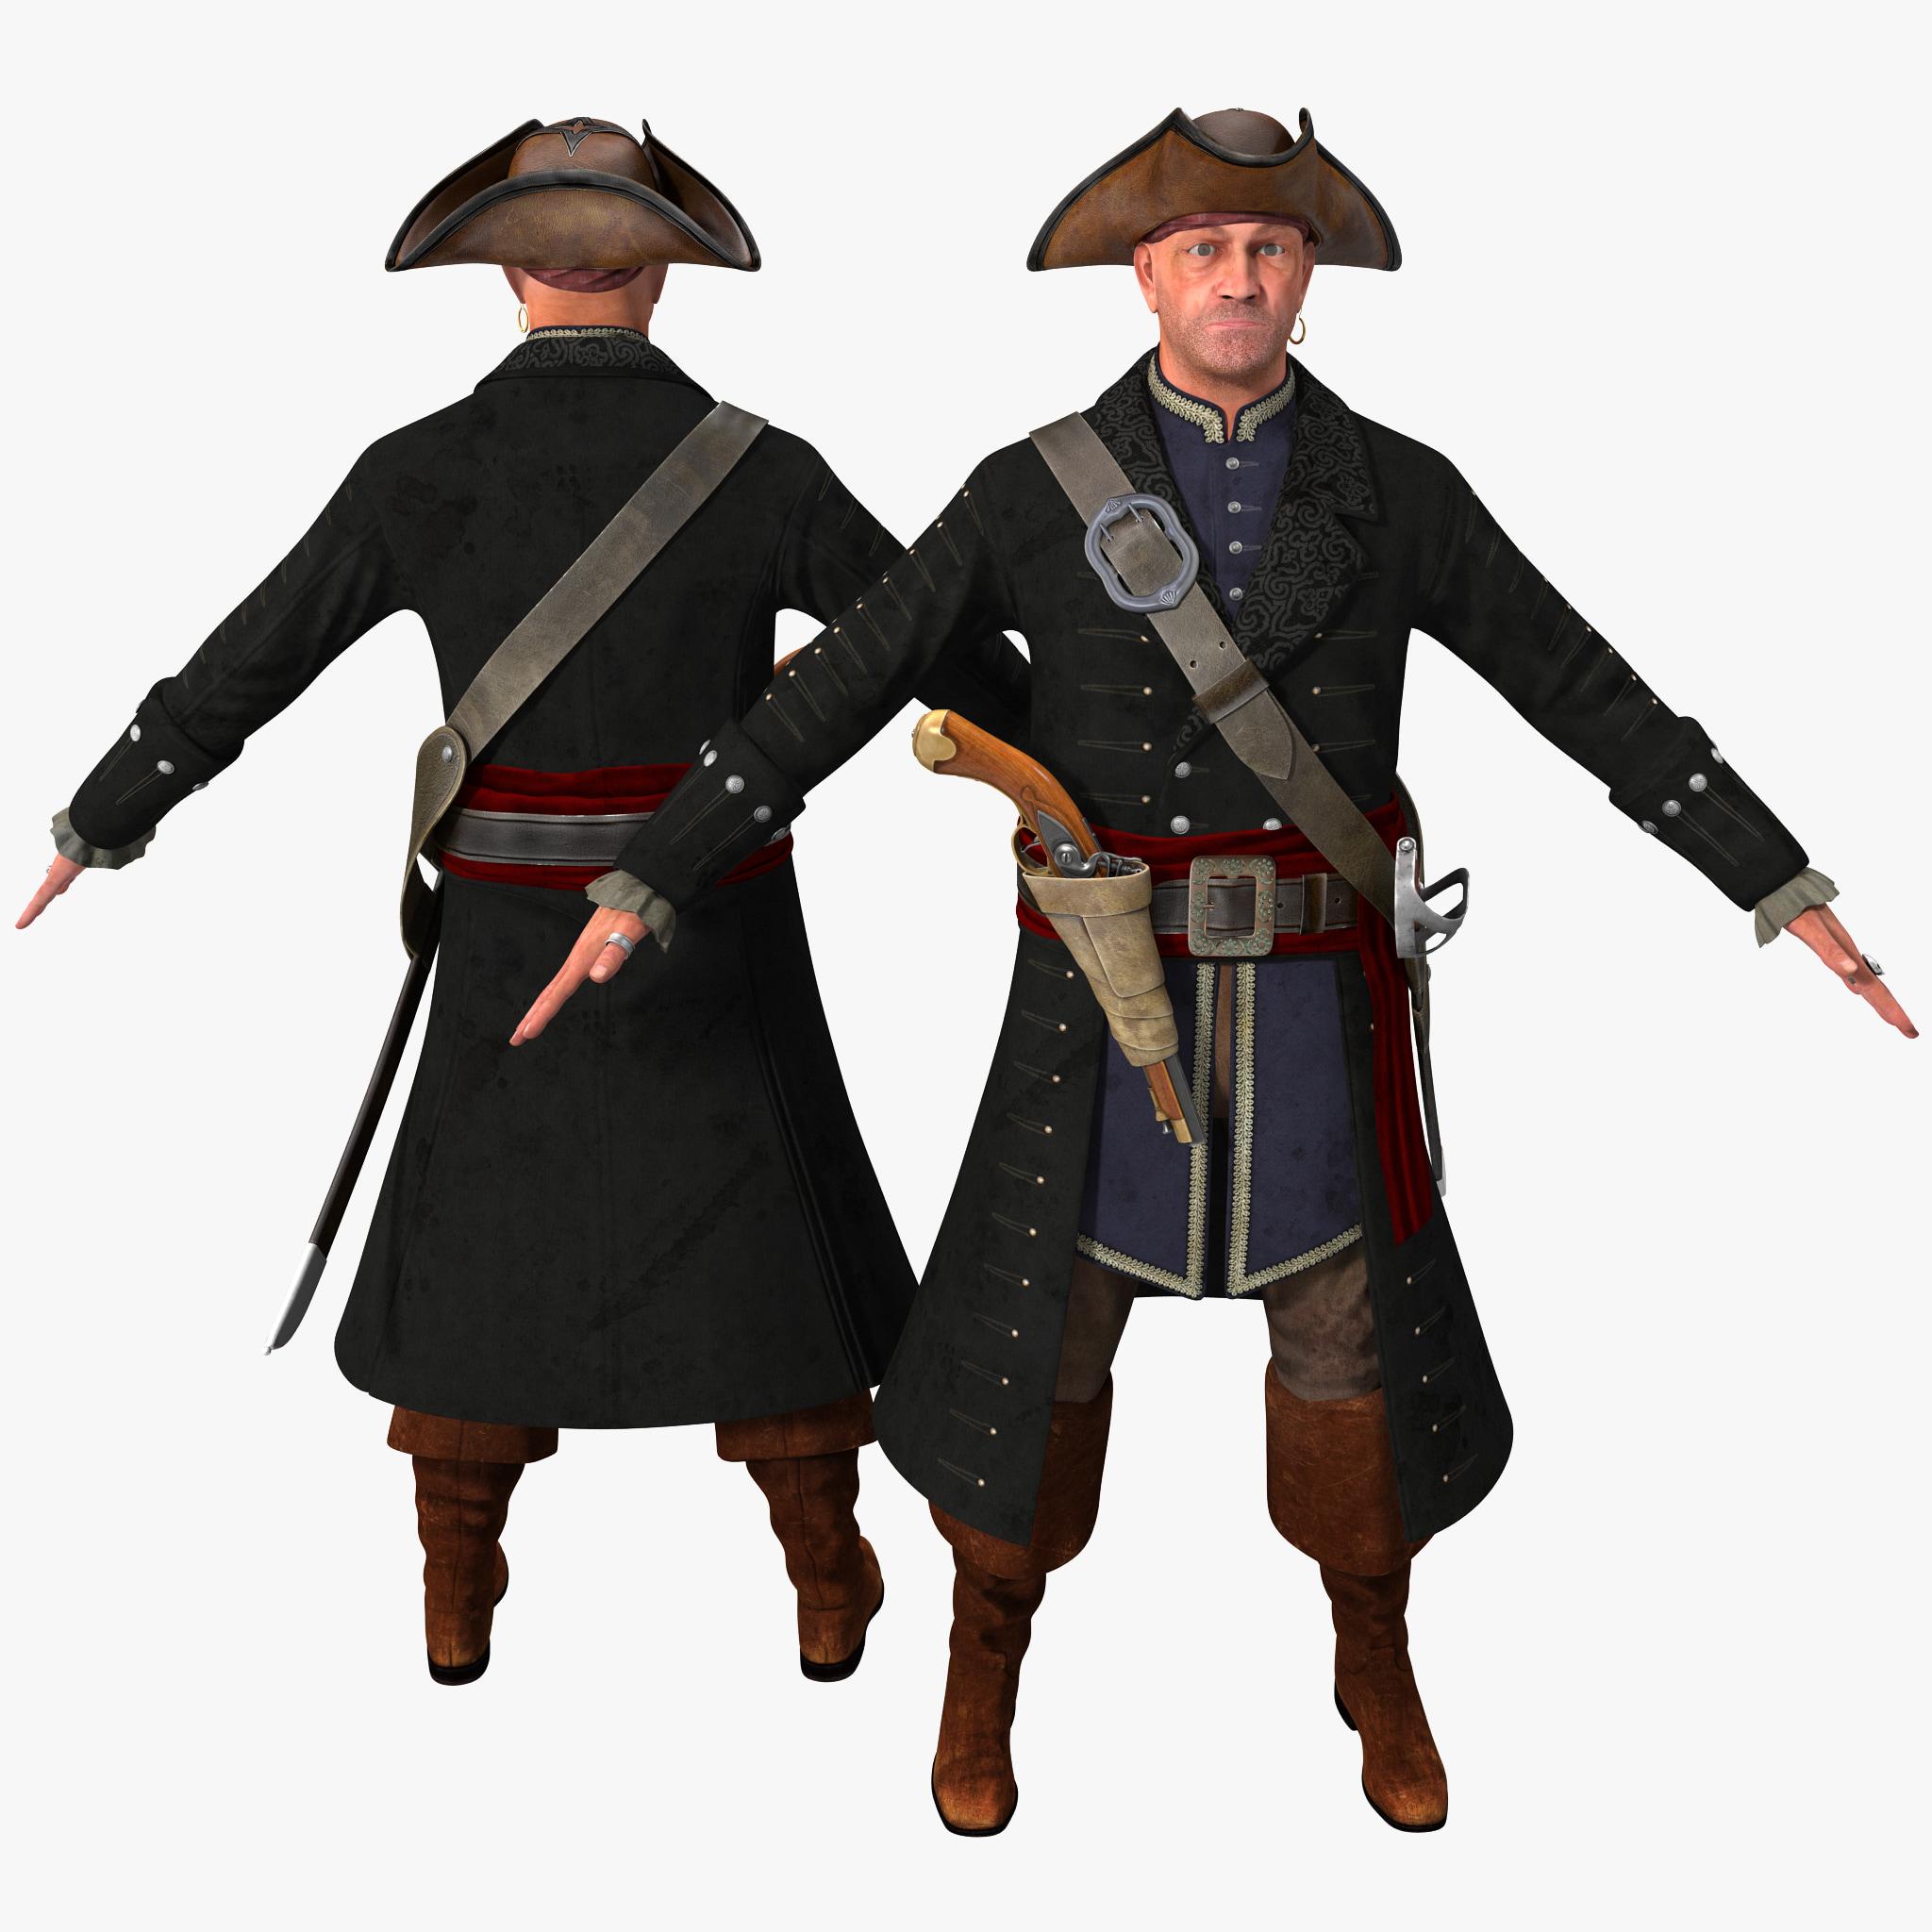 Pirate_8.jpg